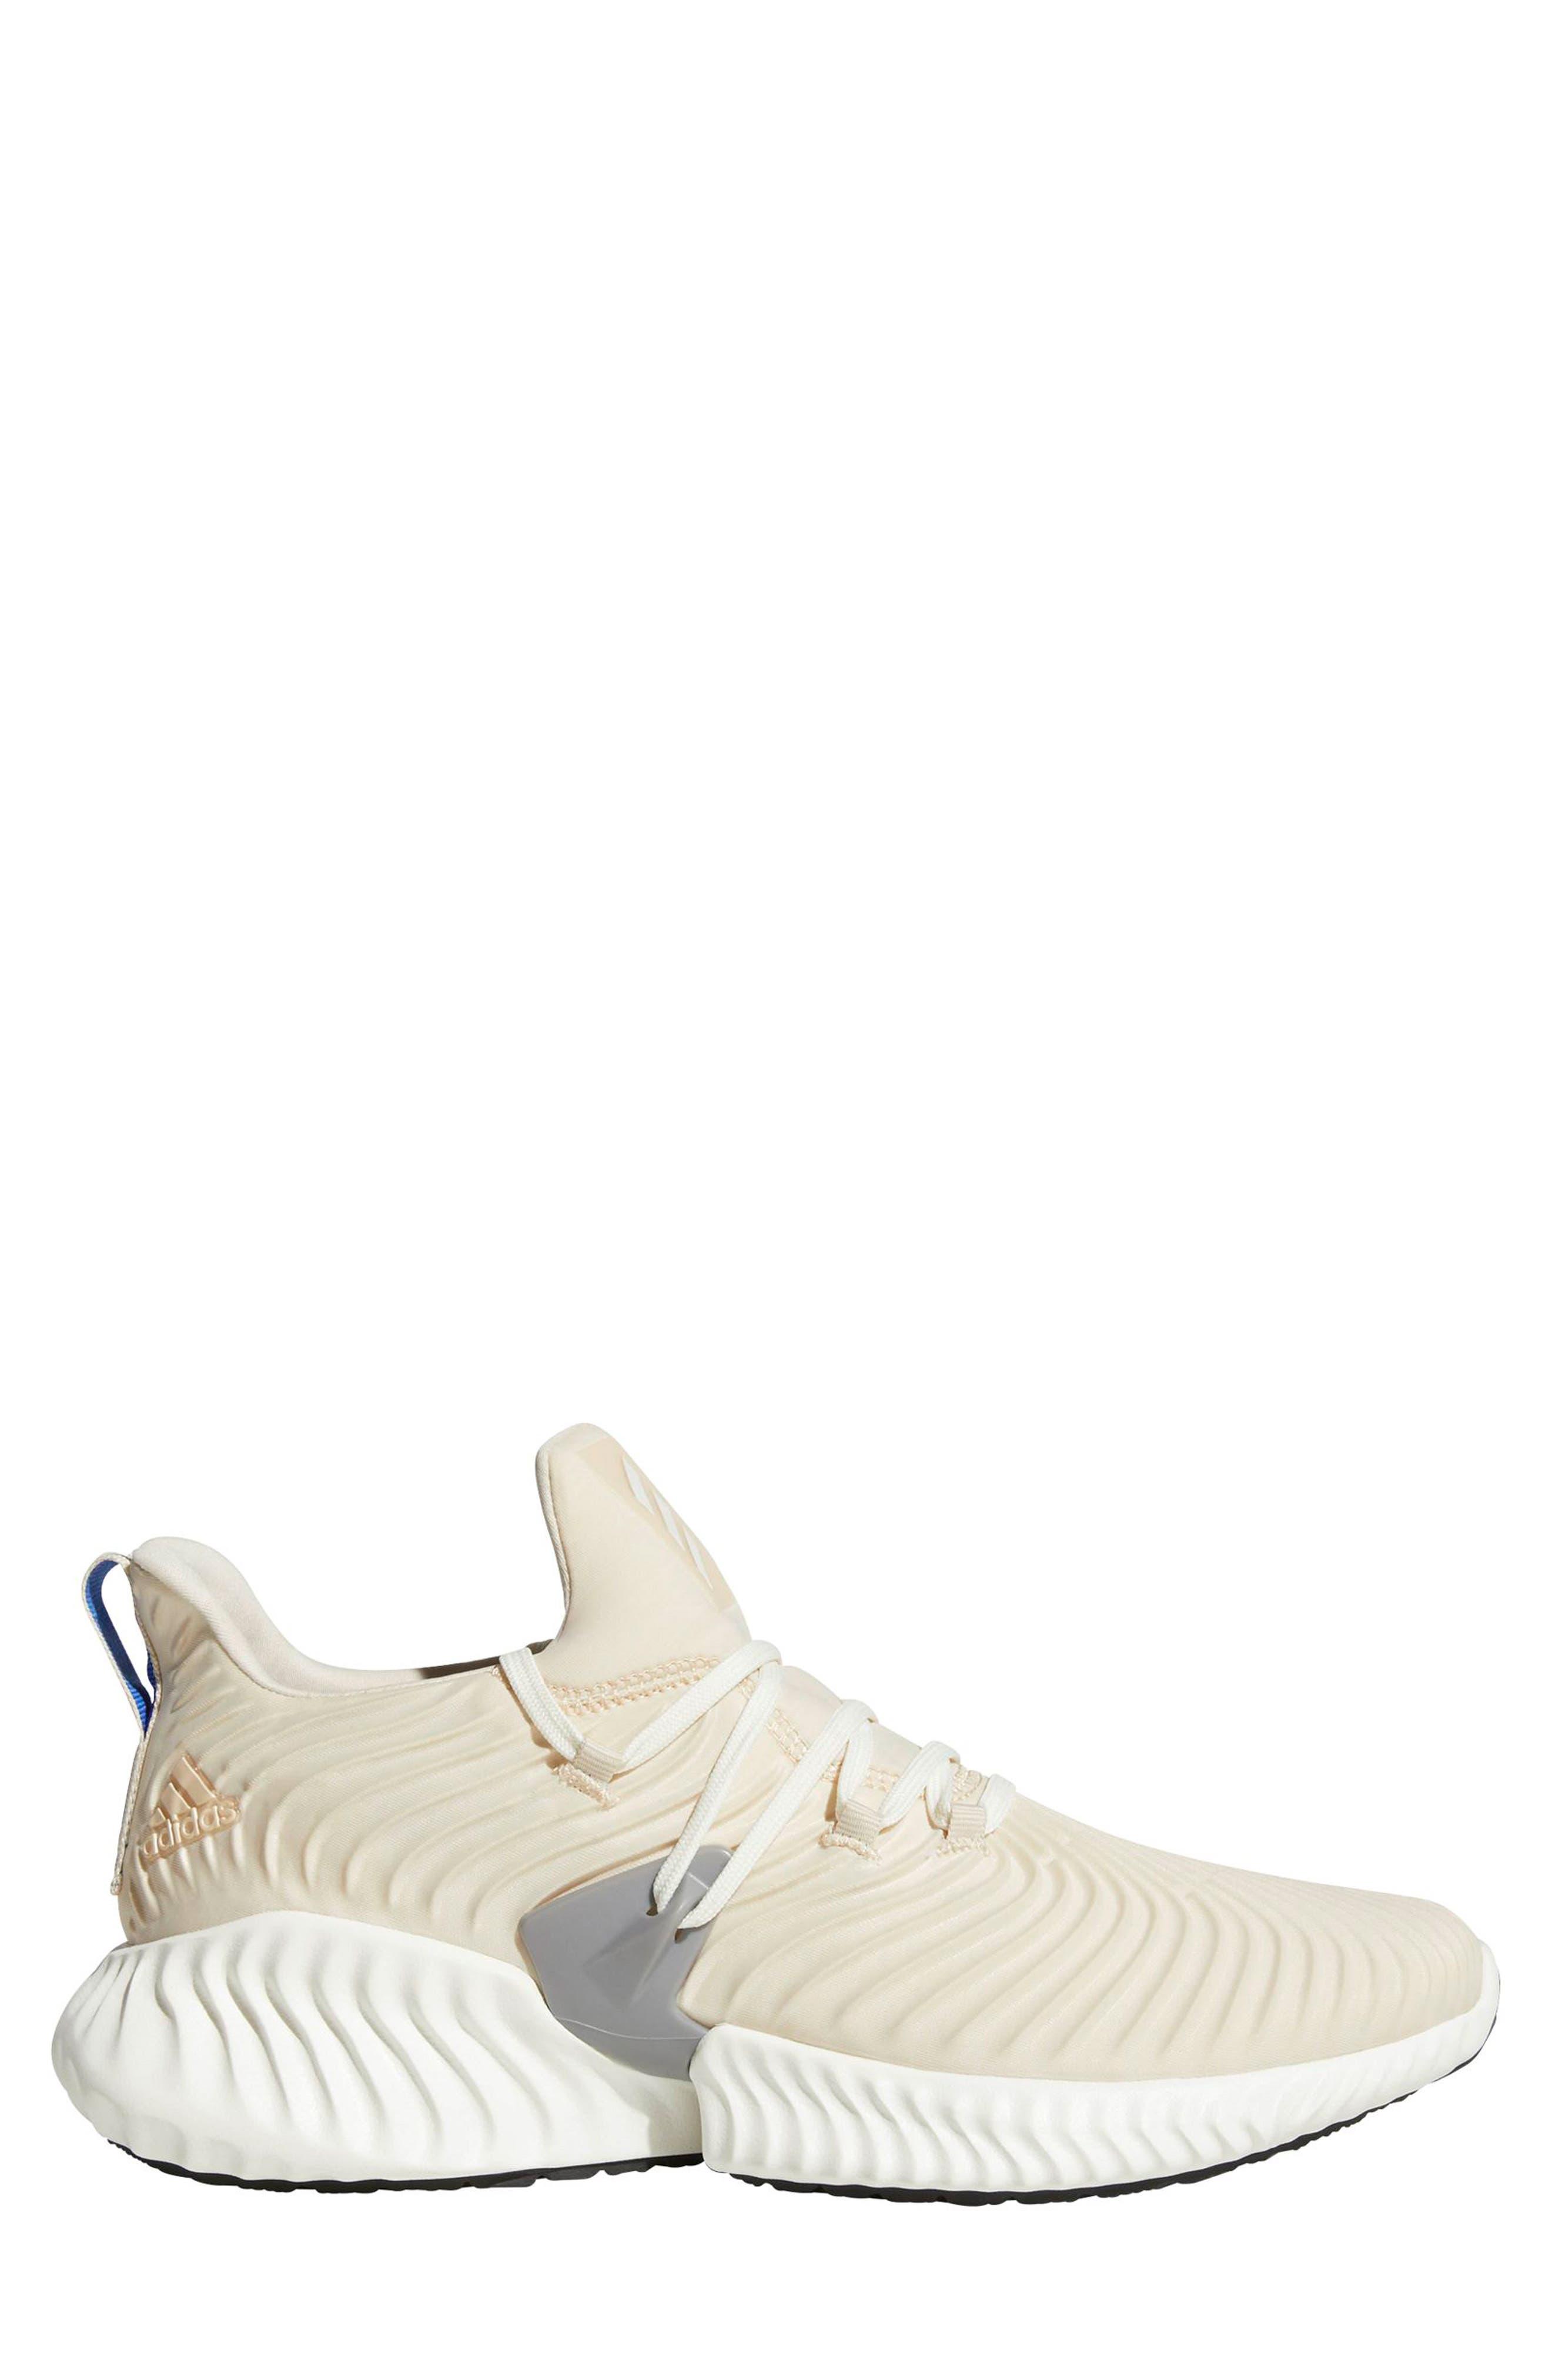 AlphaBounce Instinct Running Shoe,                         Main,                         color, LINEN / CLOUD WHITE / GREY